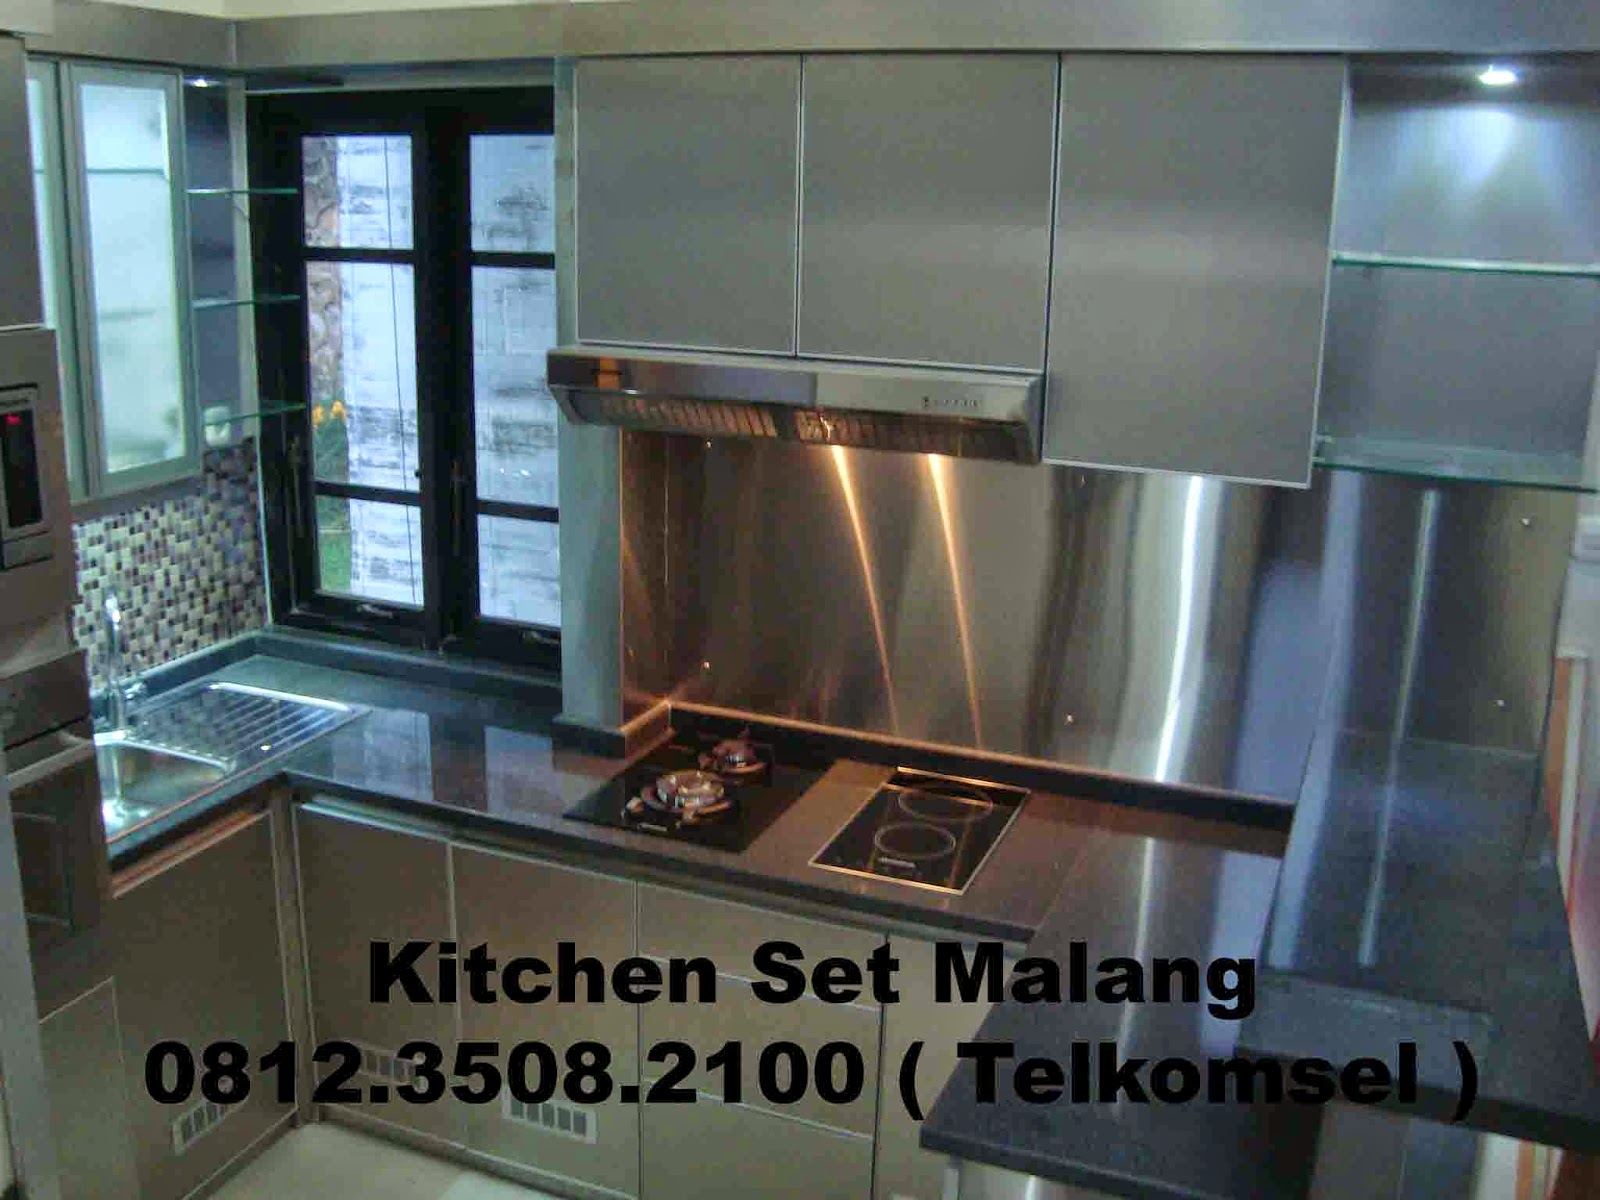 Kitchen set malang murah kitchen set di malang jasa for Harga kitchen set stainless per meter